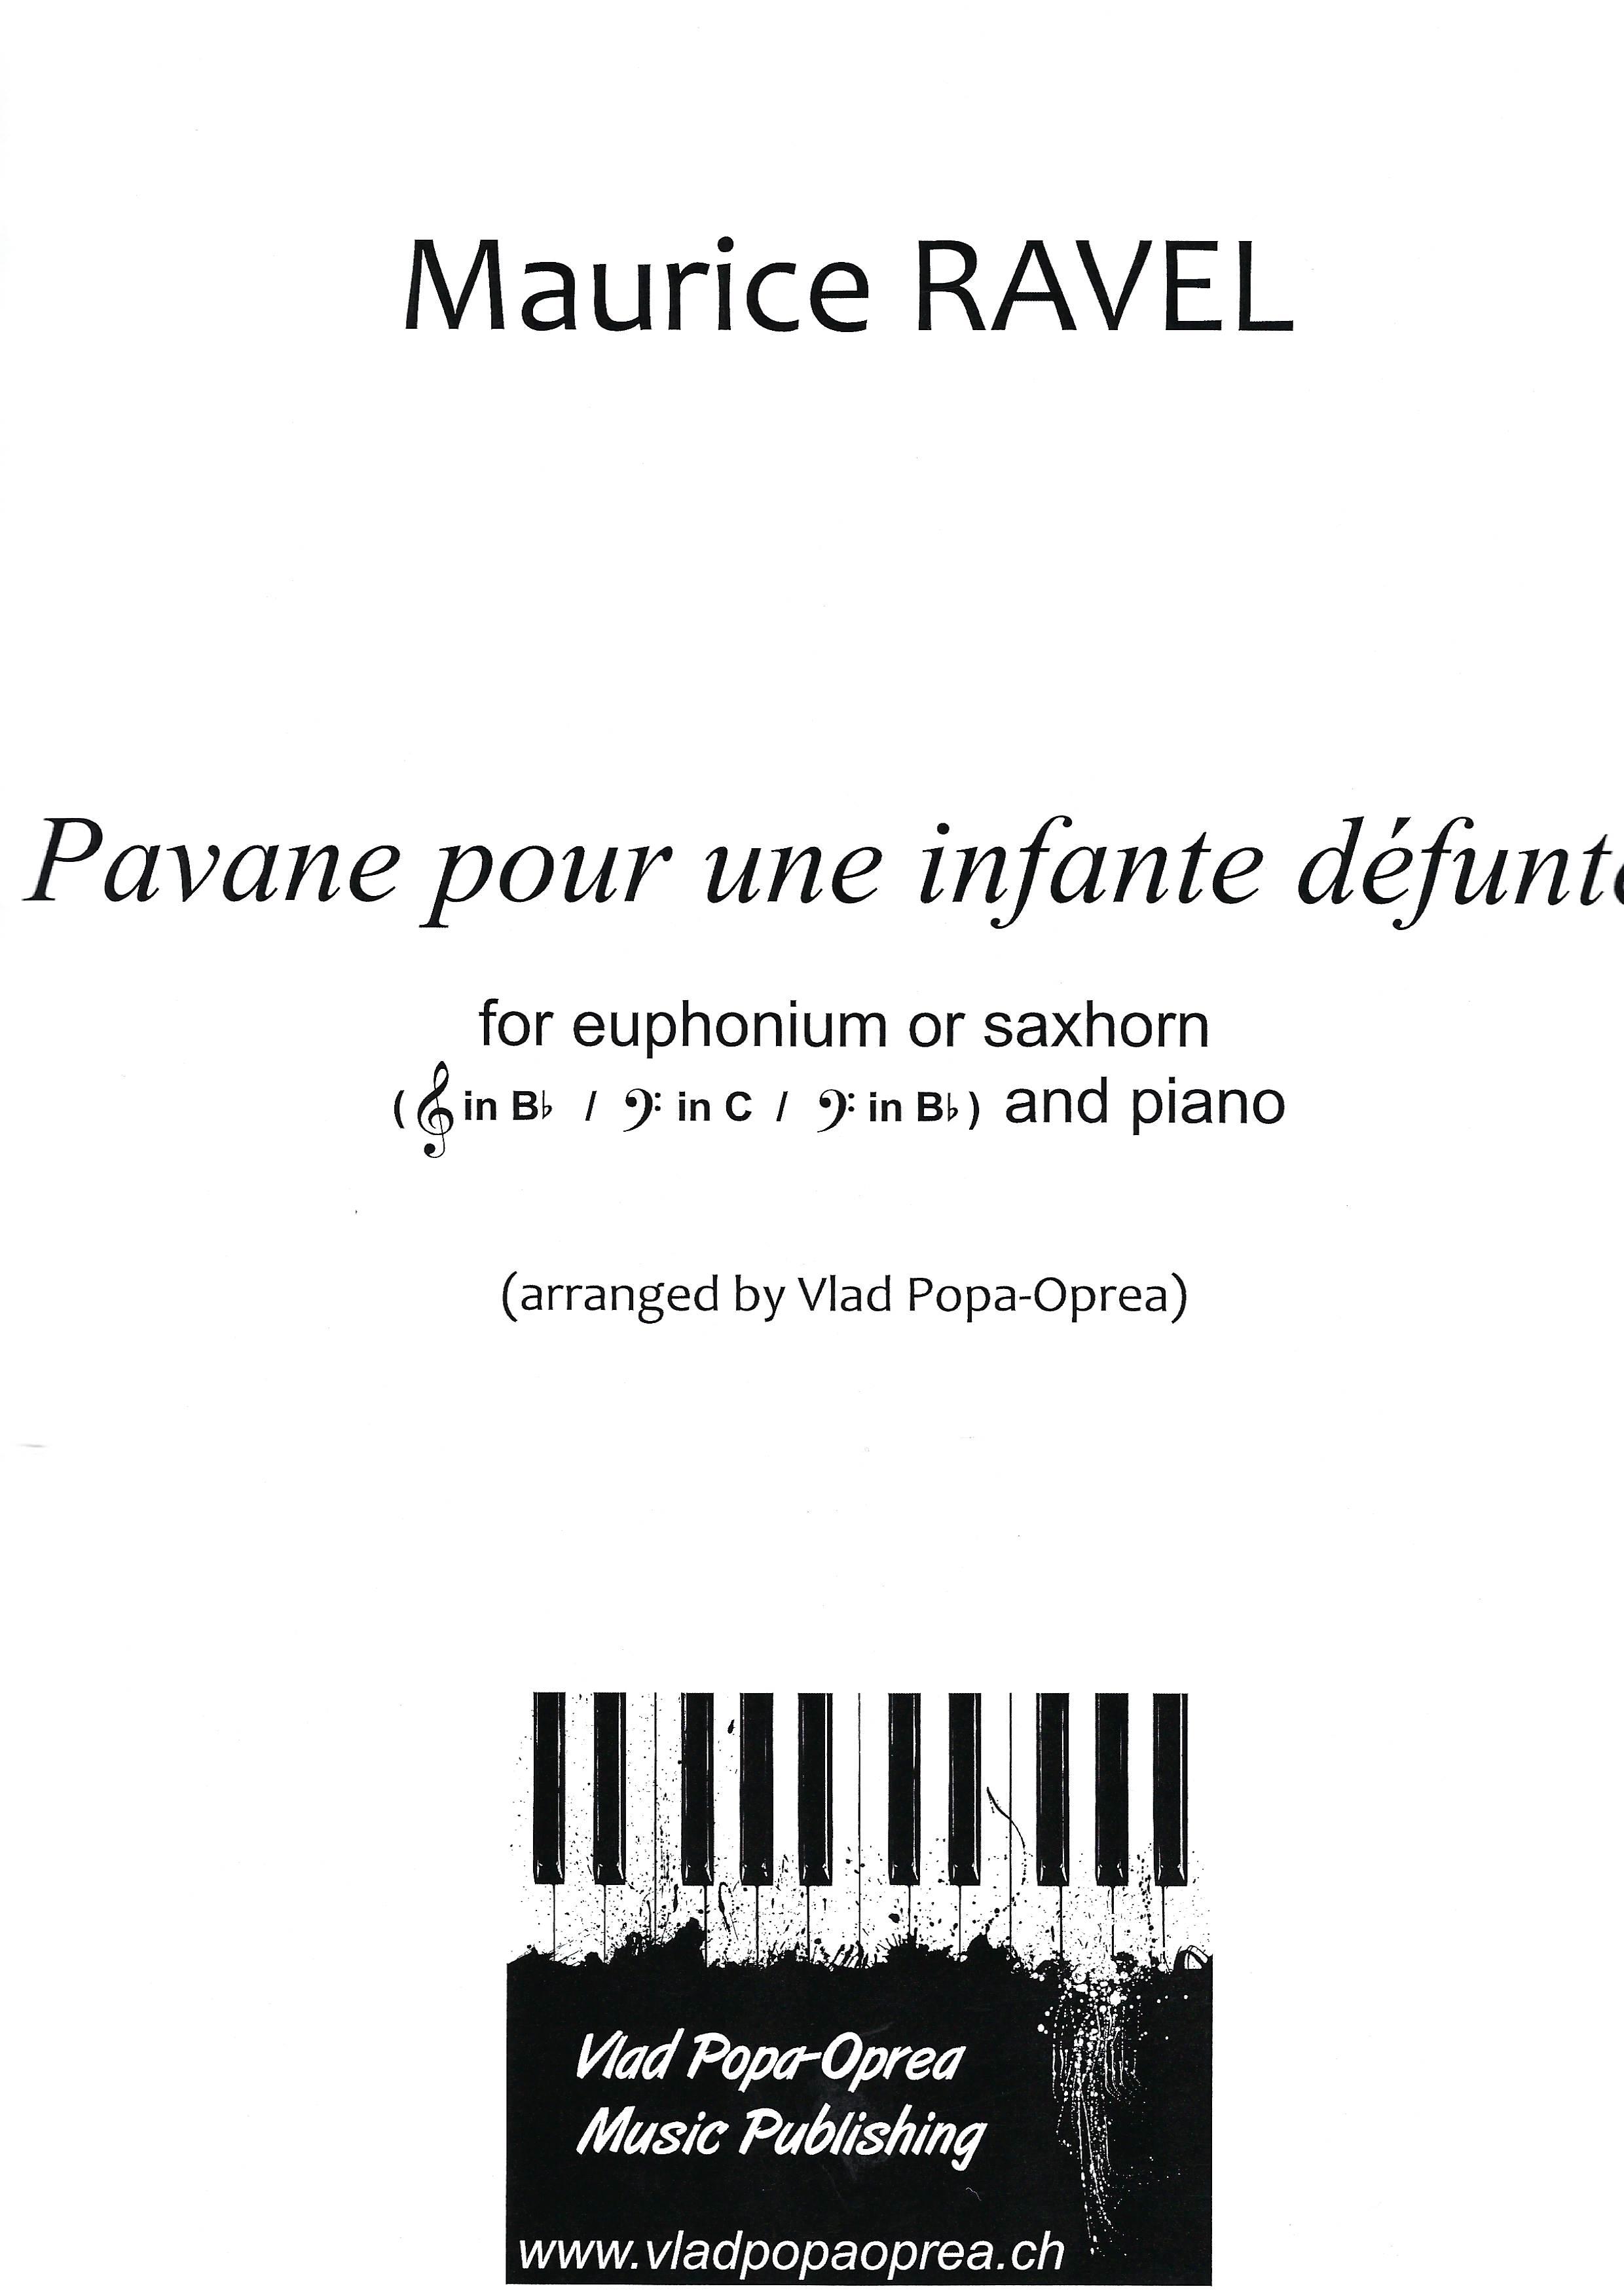 Pavane pour une Infante Defunte - Maurice Ravel Arr. Vlad Popa-Oprea - Euphonium or Baritone and Piano